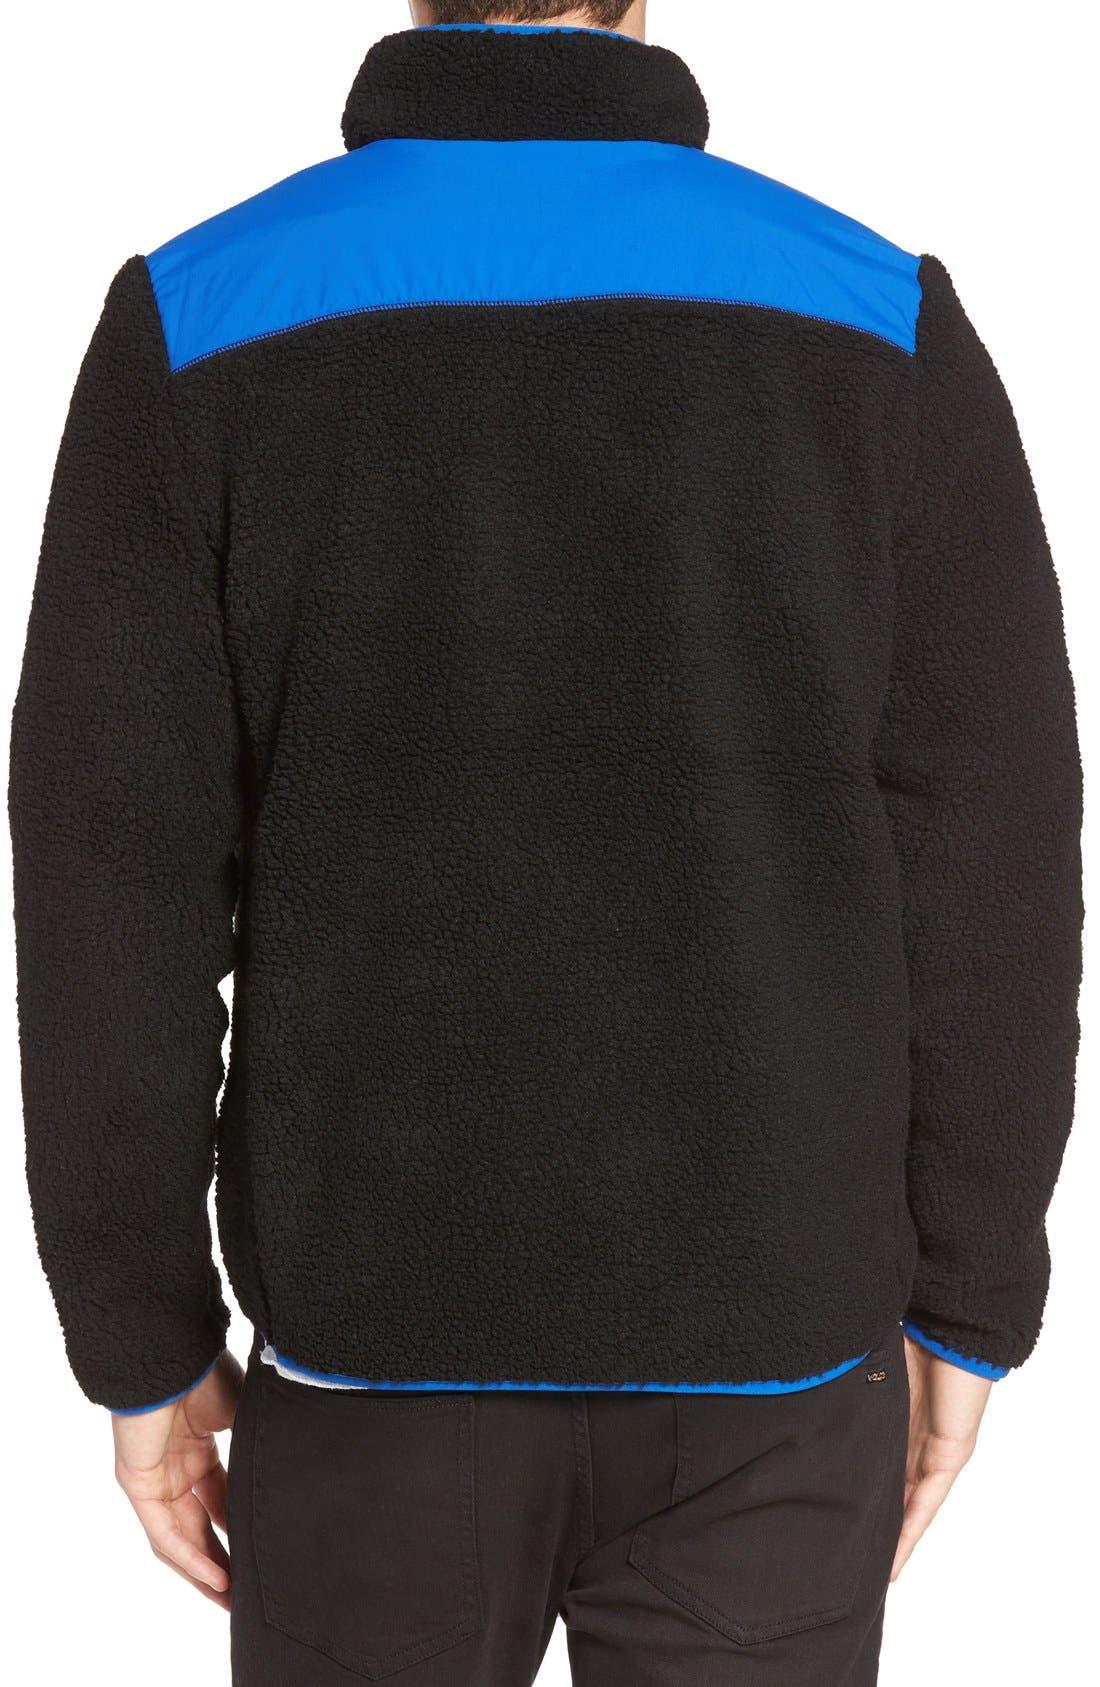 Mattawa Zip Fleece Jacket,                             Alternate thumbnail 5, color,                             001